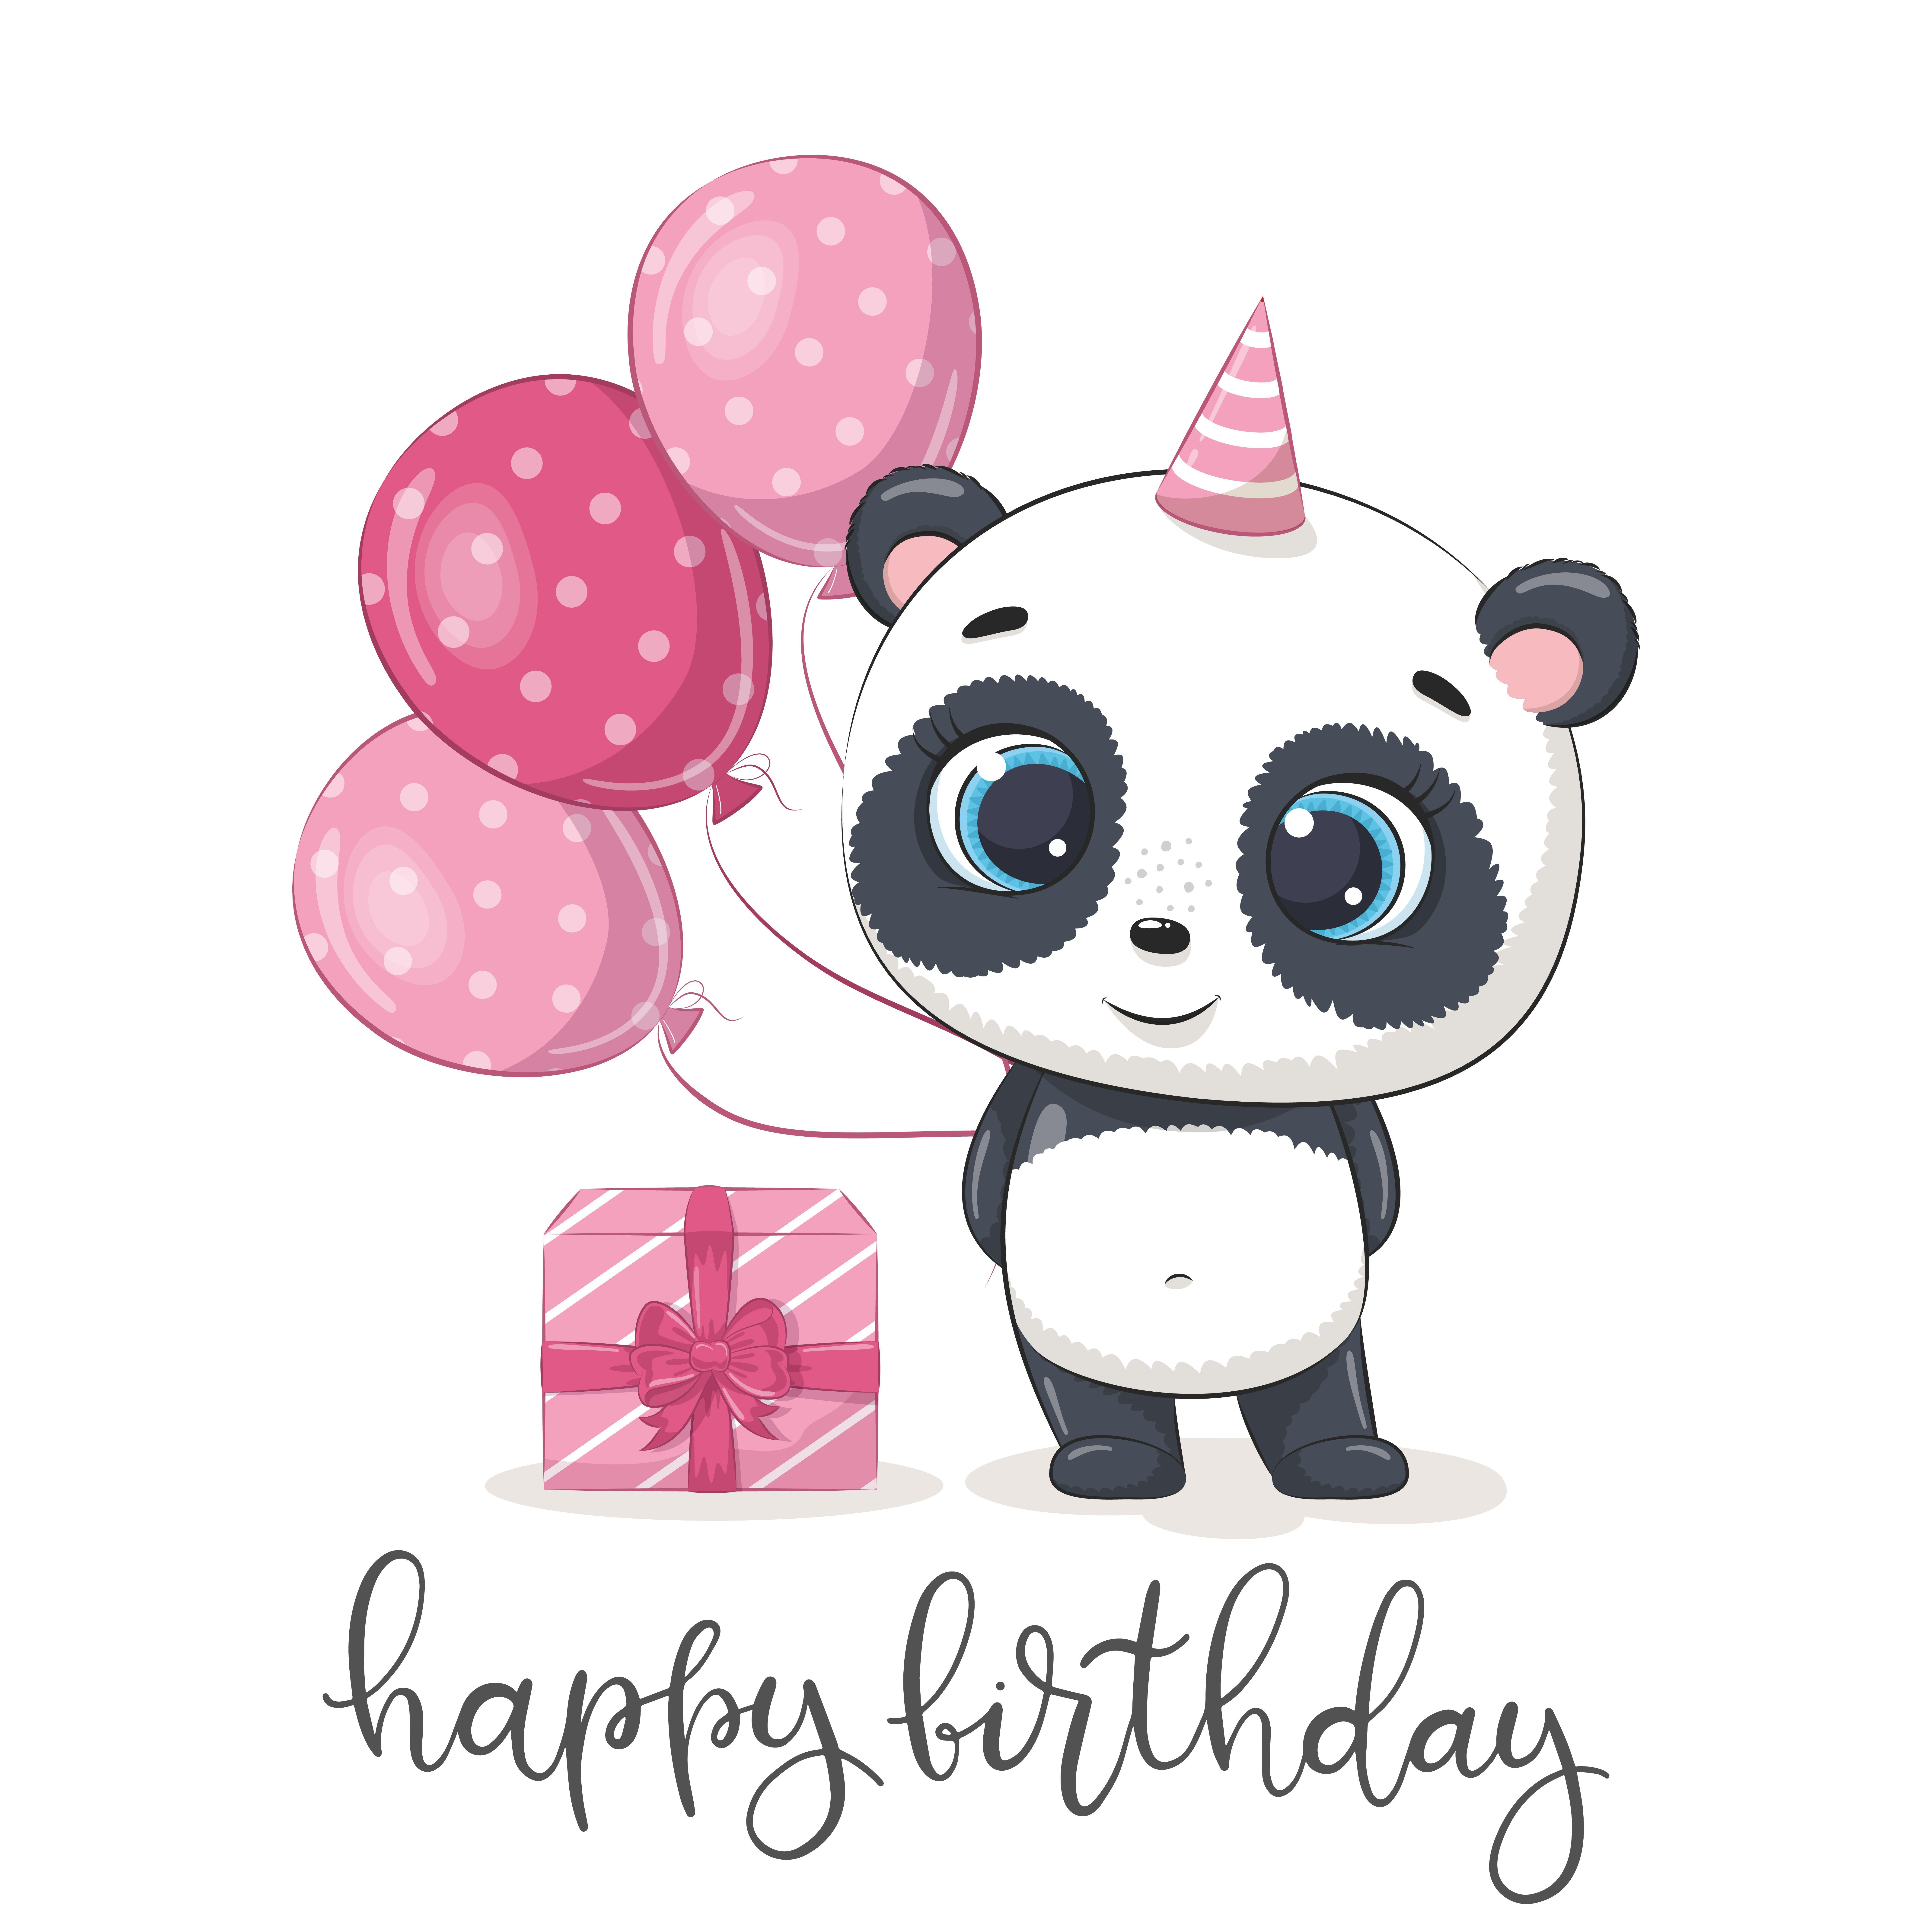 Cute Baby Panda Birthday Clipart Png Eps Girl Birthday Clipart Panda Digital Baby Panda Clipart Baby Panda Png Panda Girl In 2021 Panda Birthday Cute Panda Wallpaper Birthday Clipart